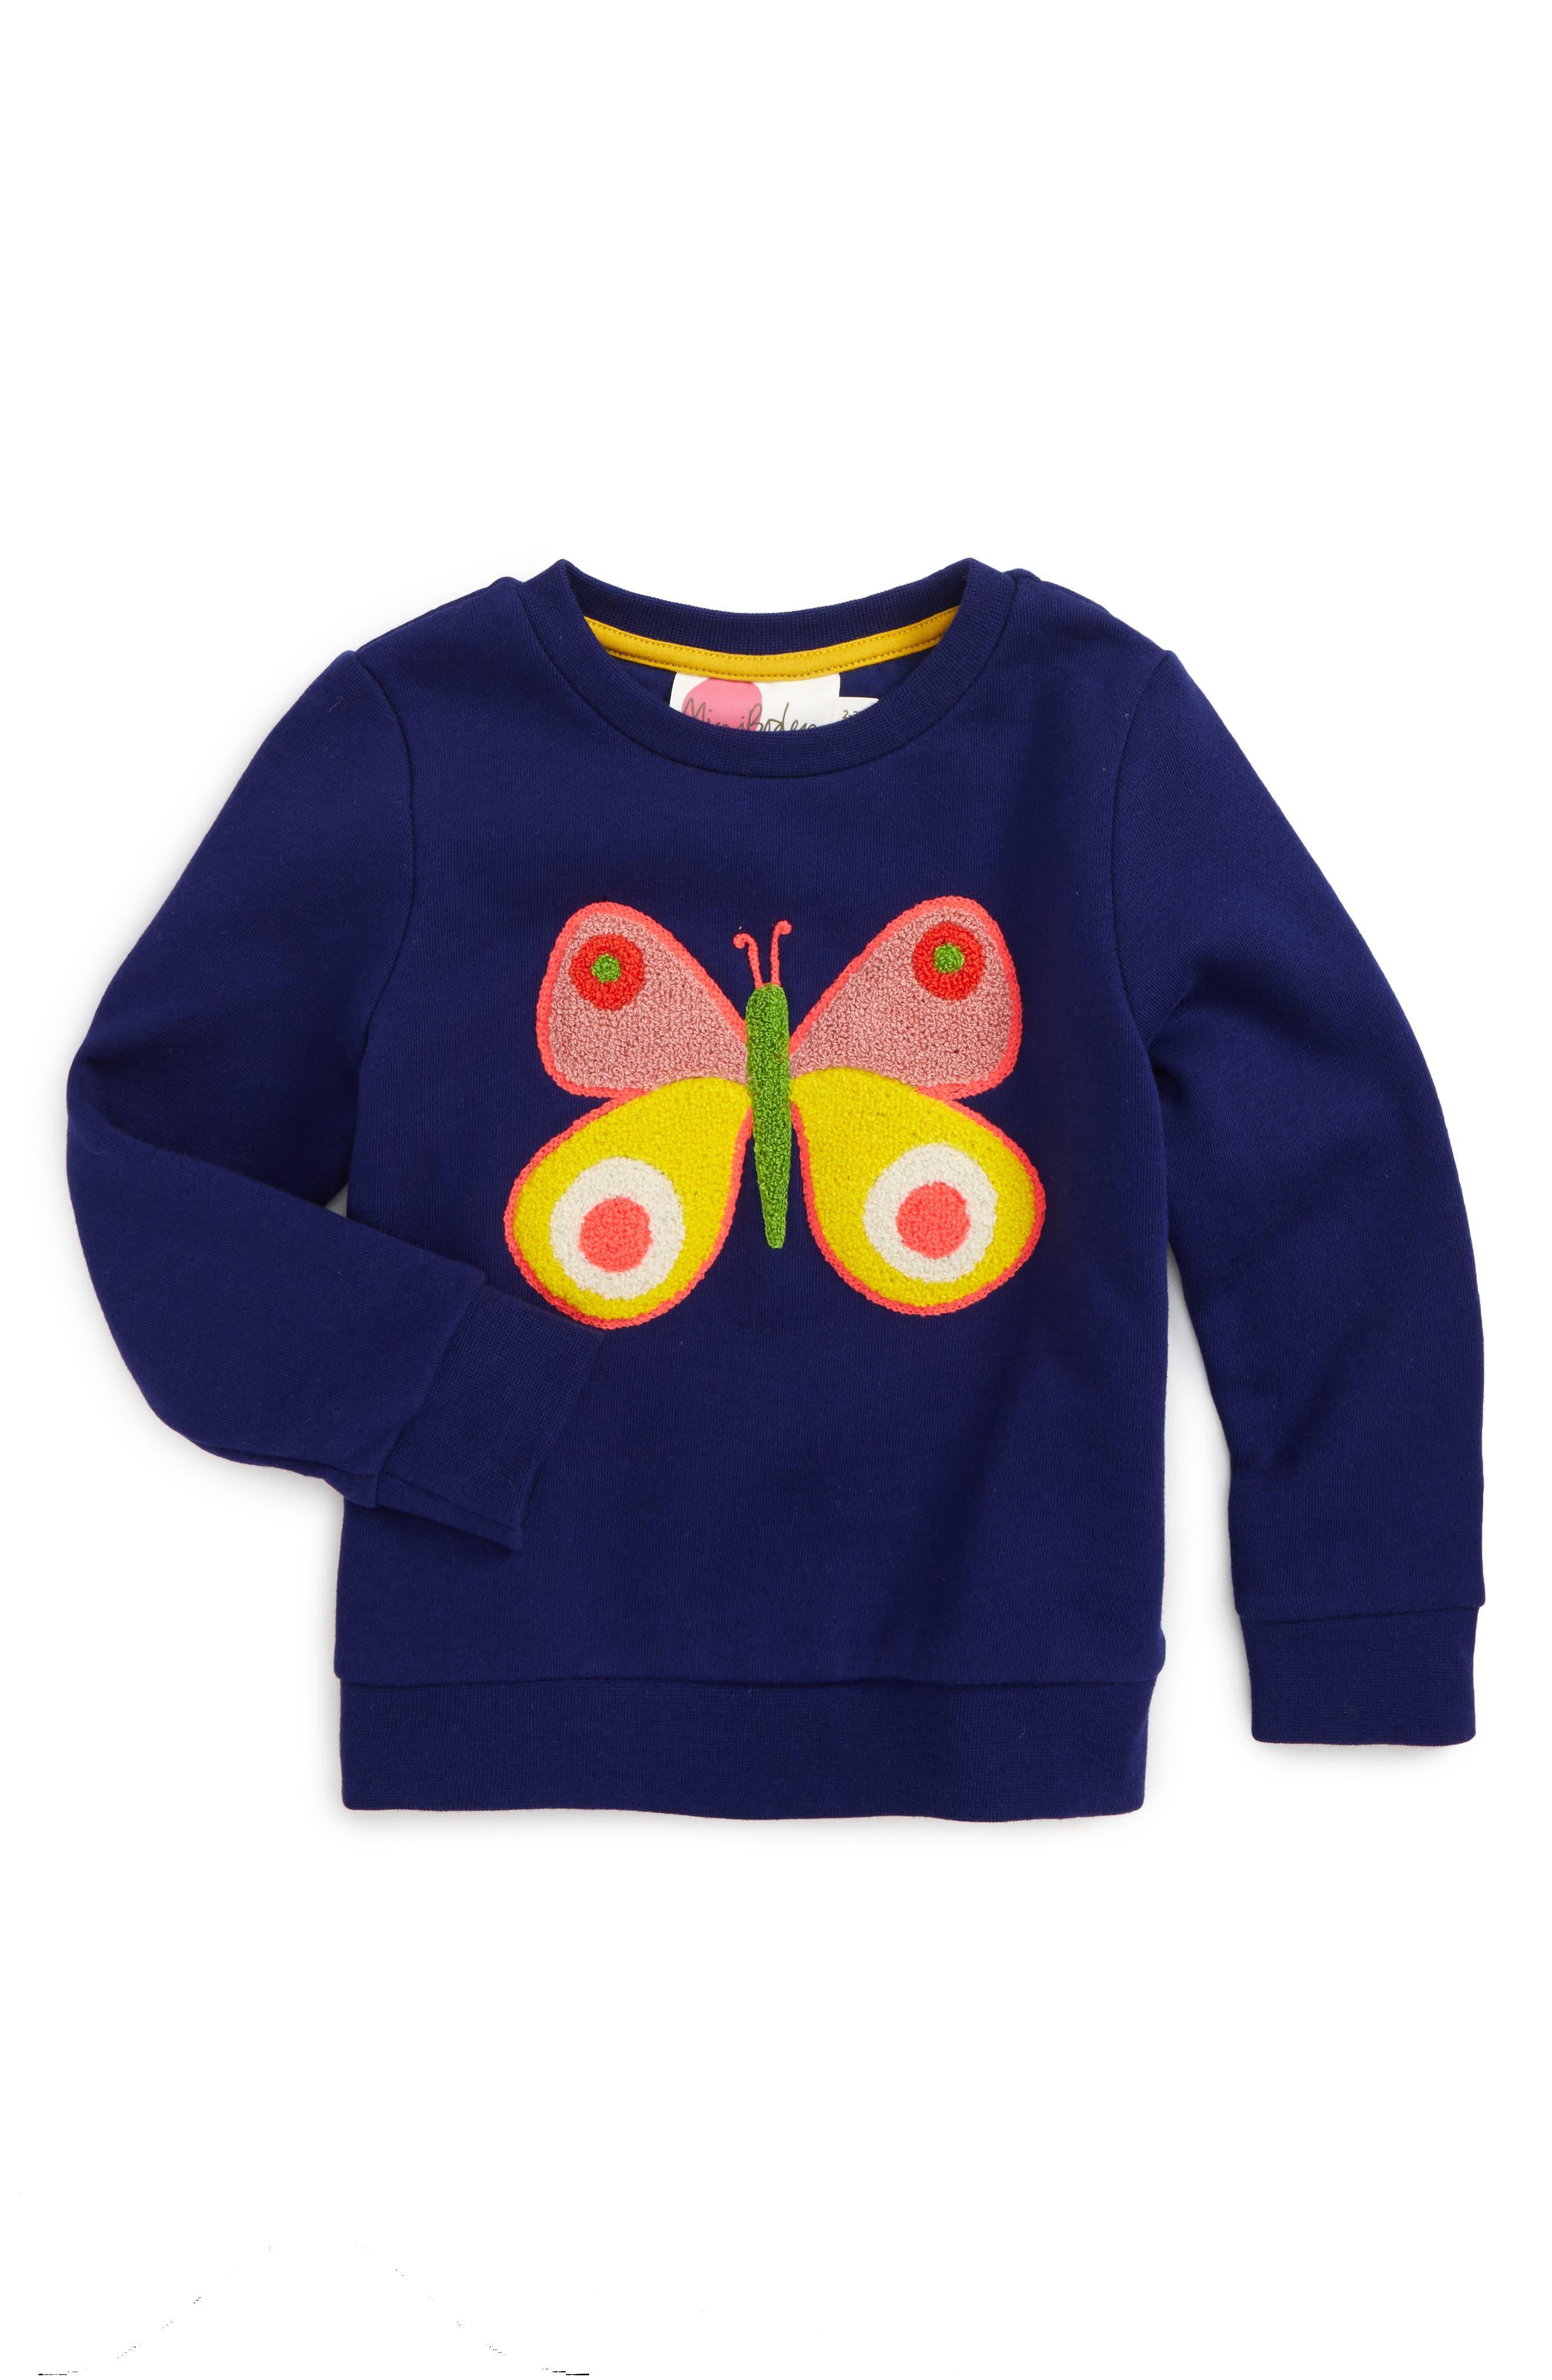 Bouclé Embroidered Sweatshirt,                         Main,                         color, 414